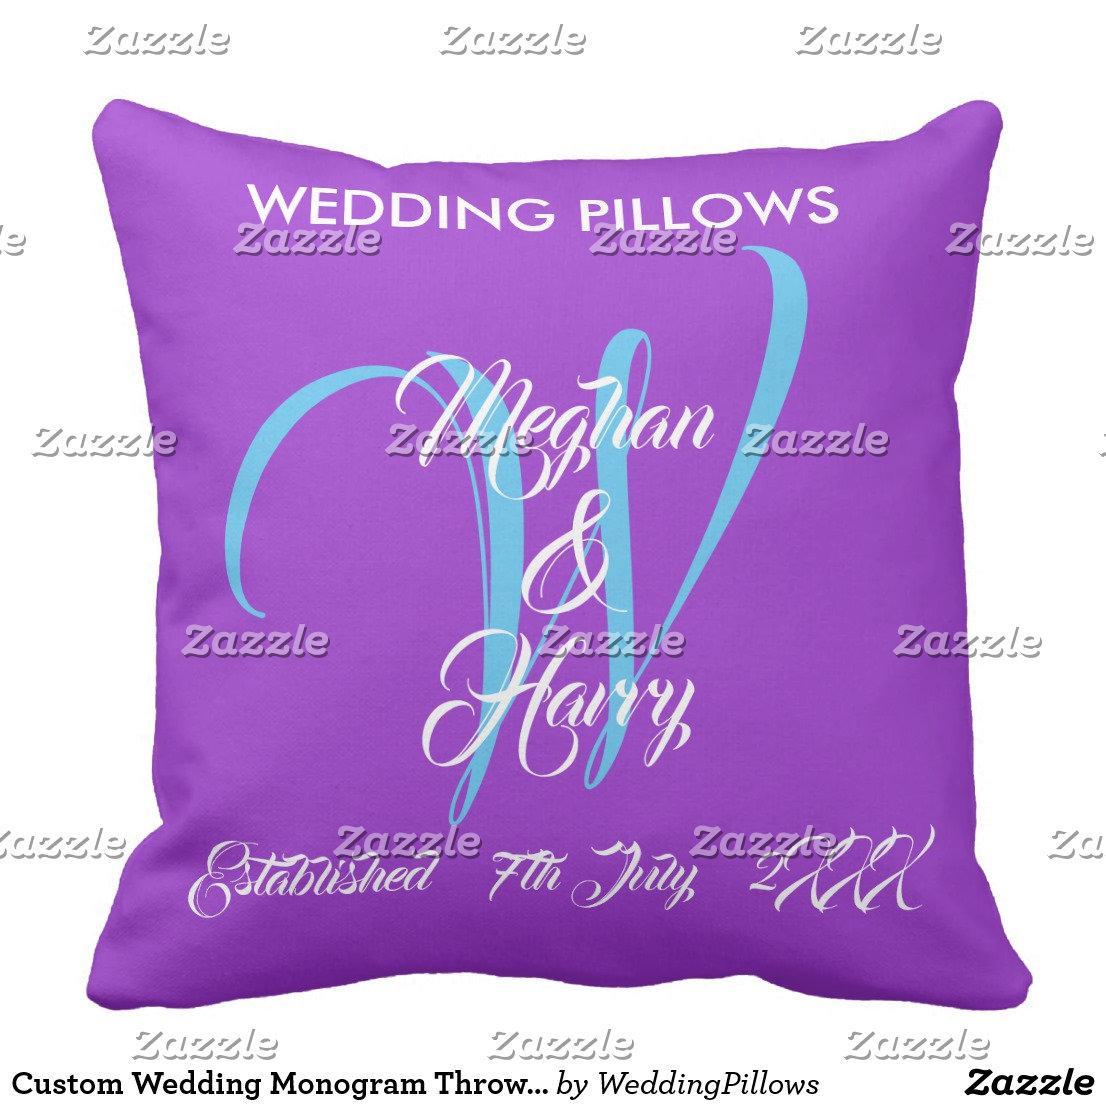 Bride & Groom Monogram Throw Pillows ORCHID PURPLE